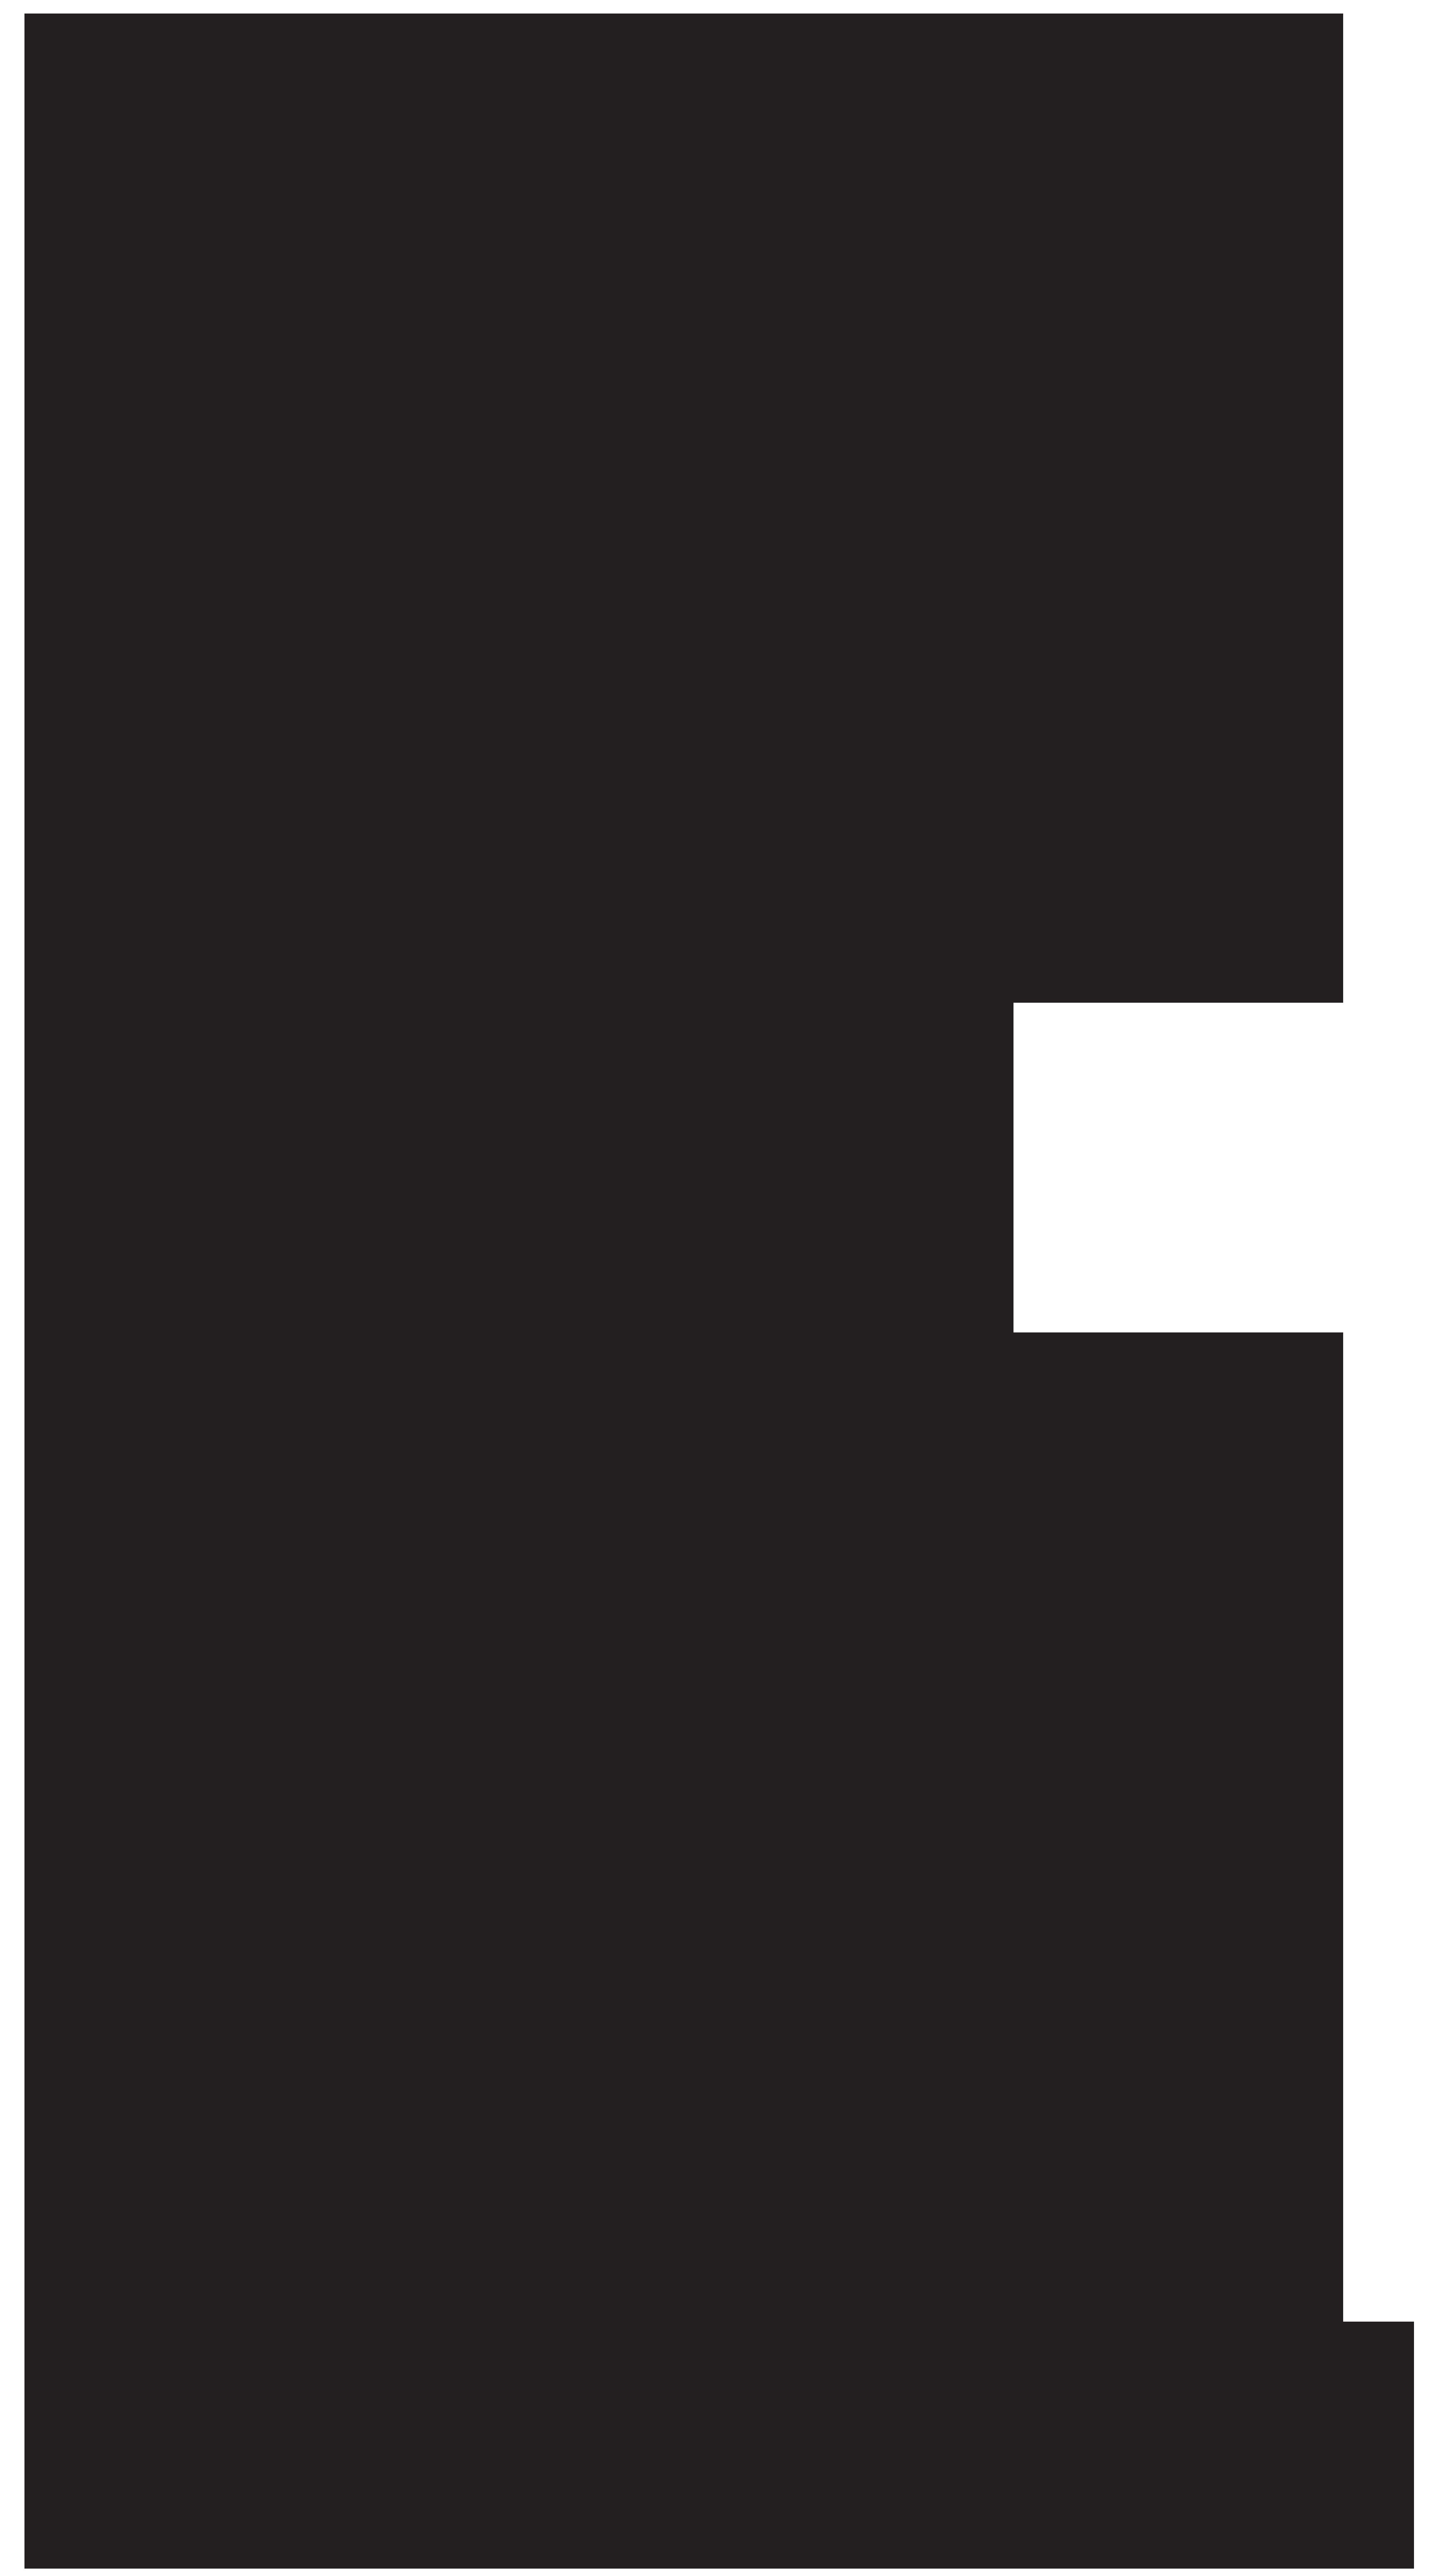 image transparent Loving silhouette png clip. Pregnant couple clipart